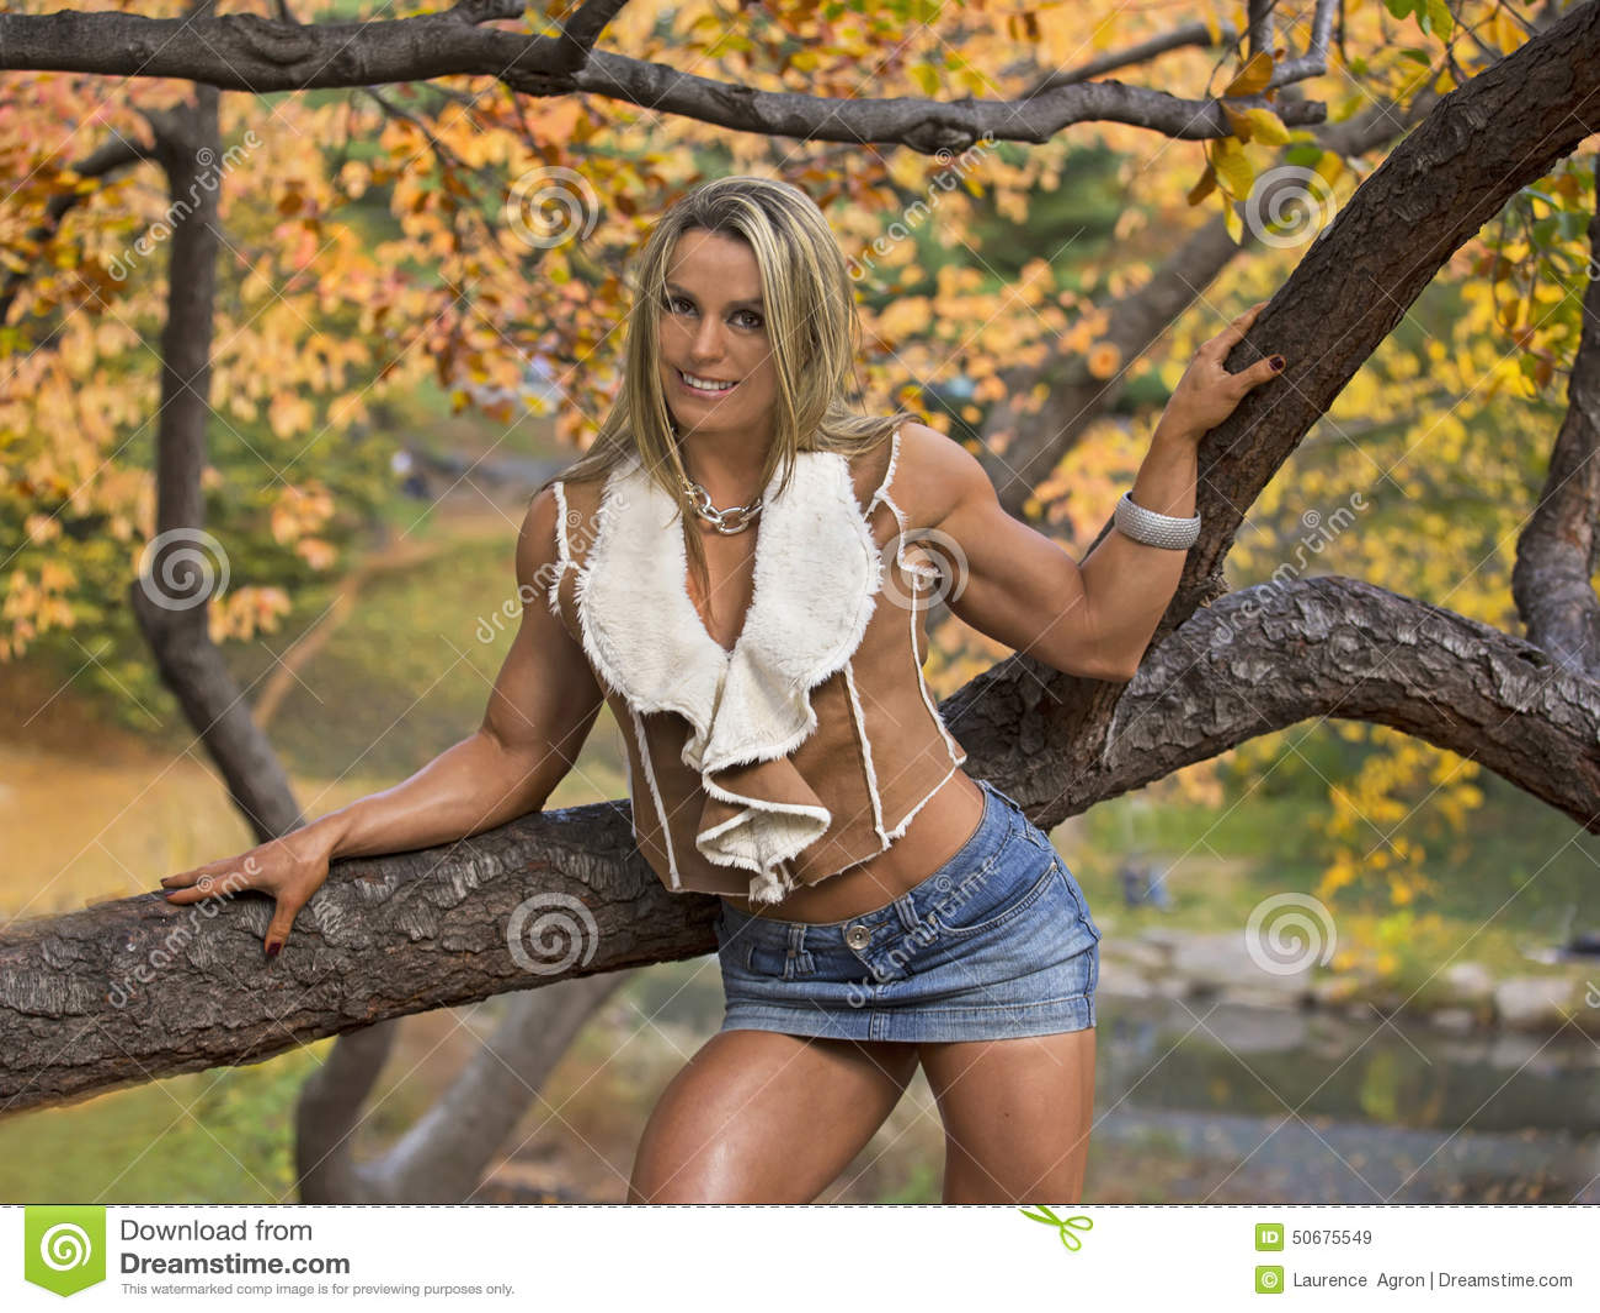 Download 在一个迷人,浅黄色的包裹的秋天辉煌 库存图片. 图片 包括有 女性, 色情, 显示, 腋窝, 自治权, 曲线美 - 50675549